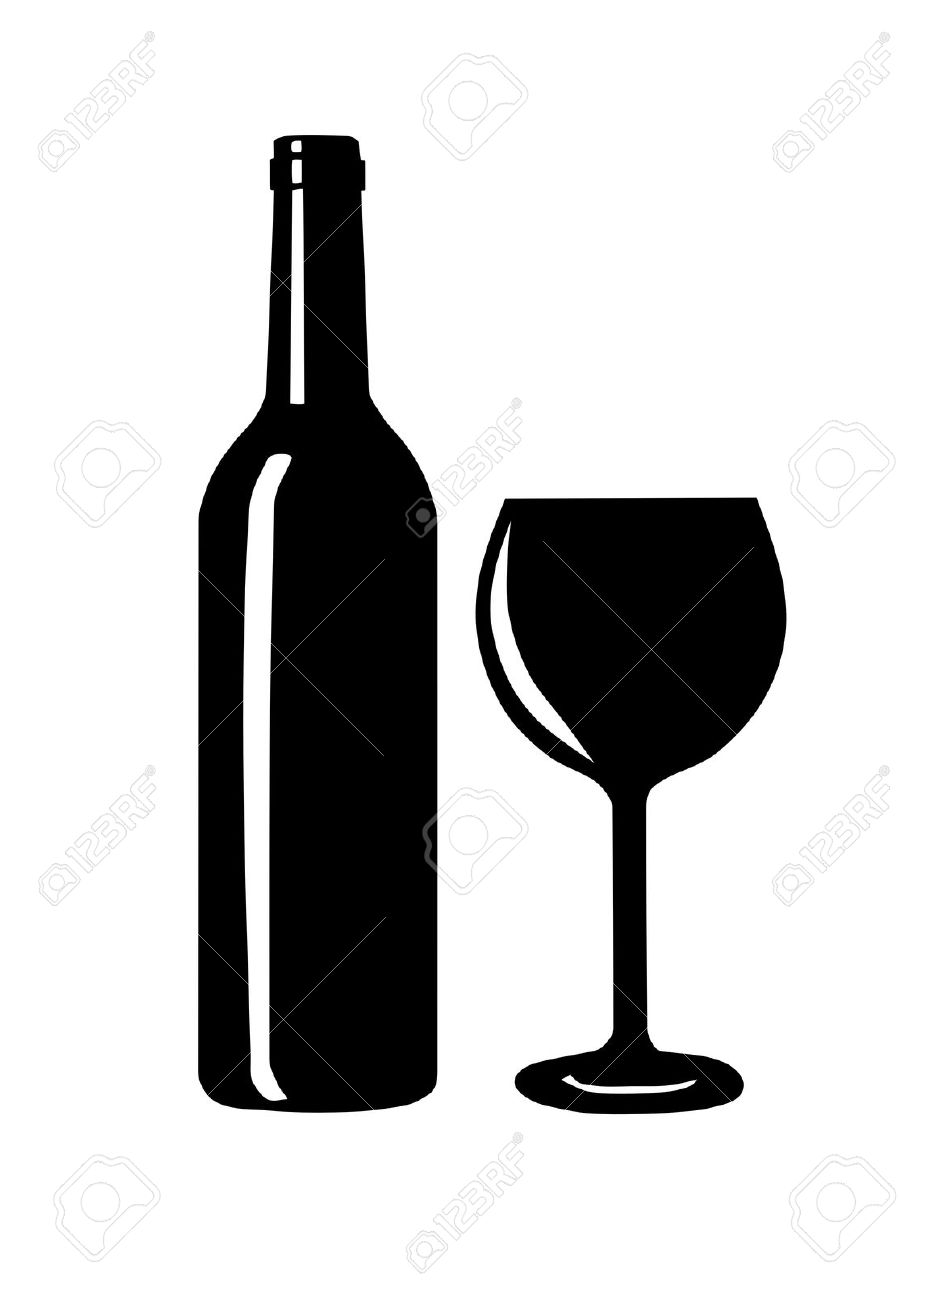 beer bottle vector silhouette at getdrawings com free for personal rh getdrawings com wine bottle vector freepik wine bottle vector free